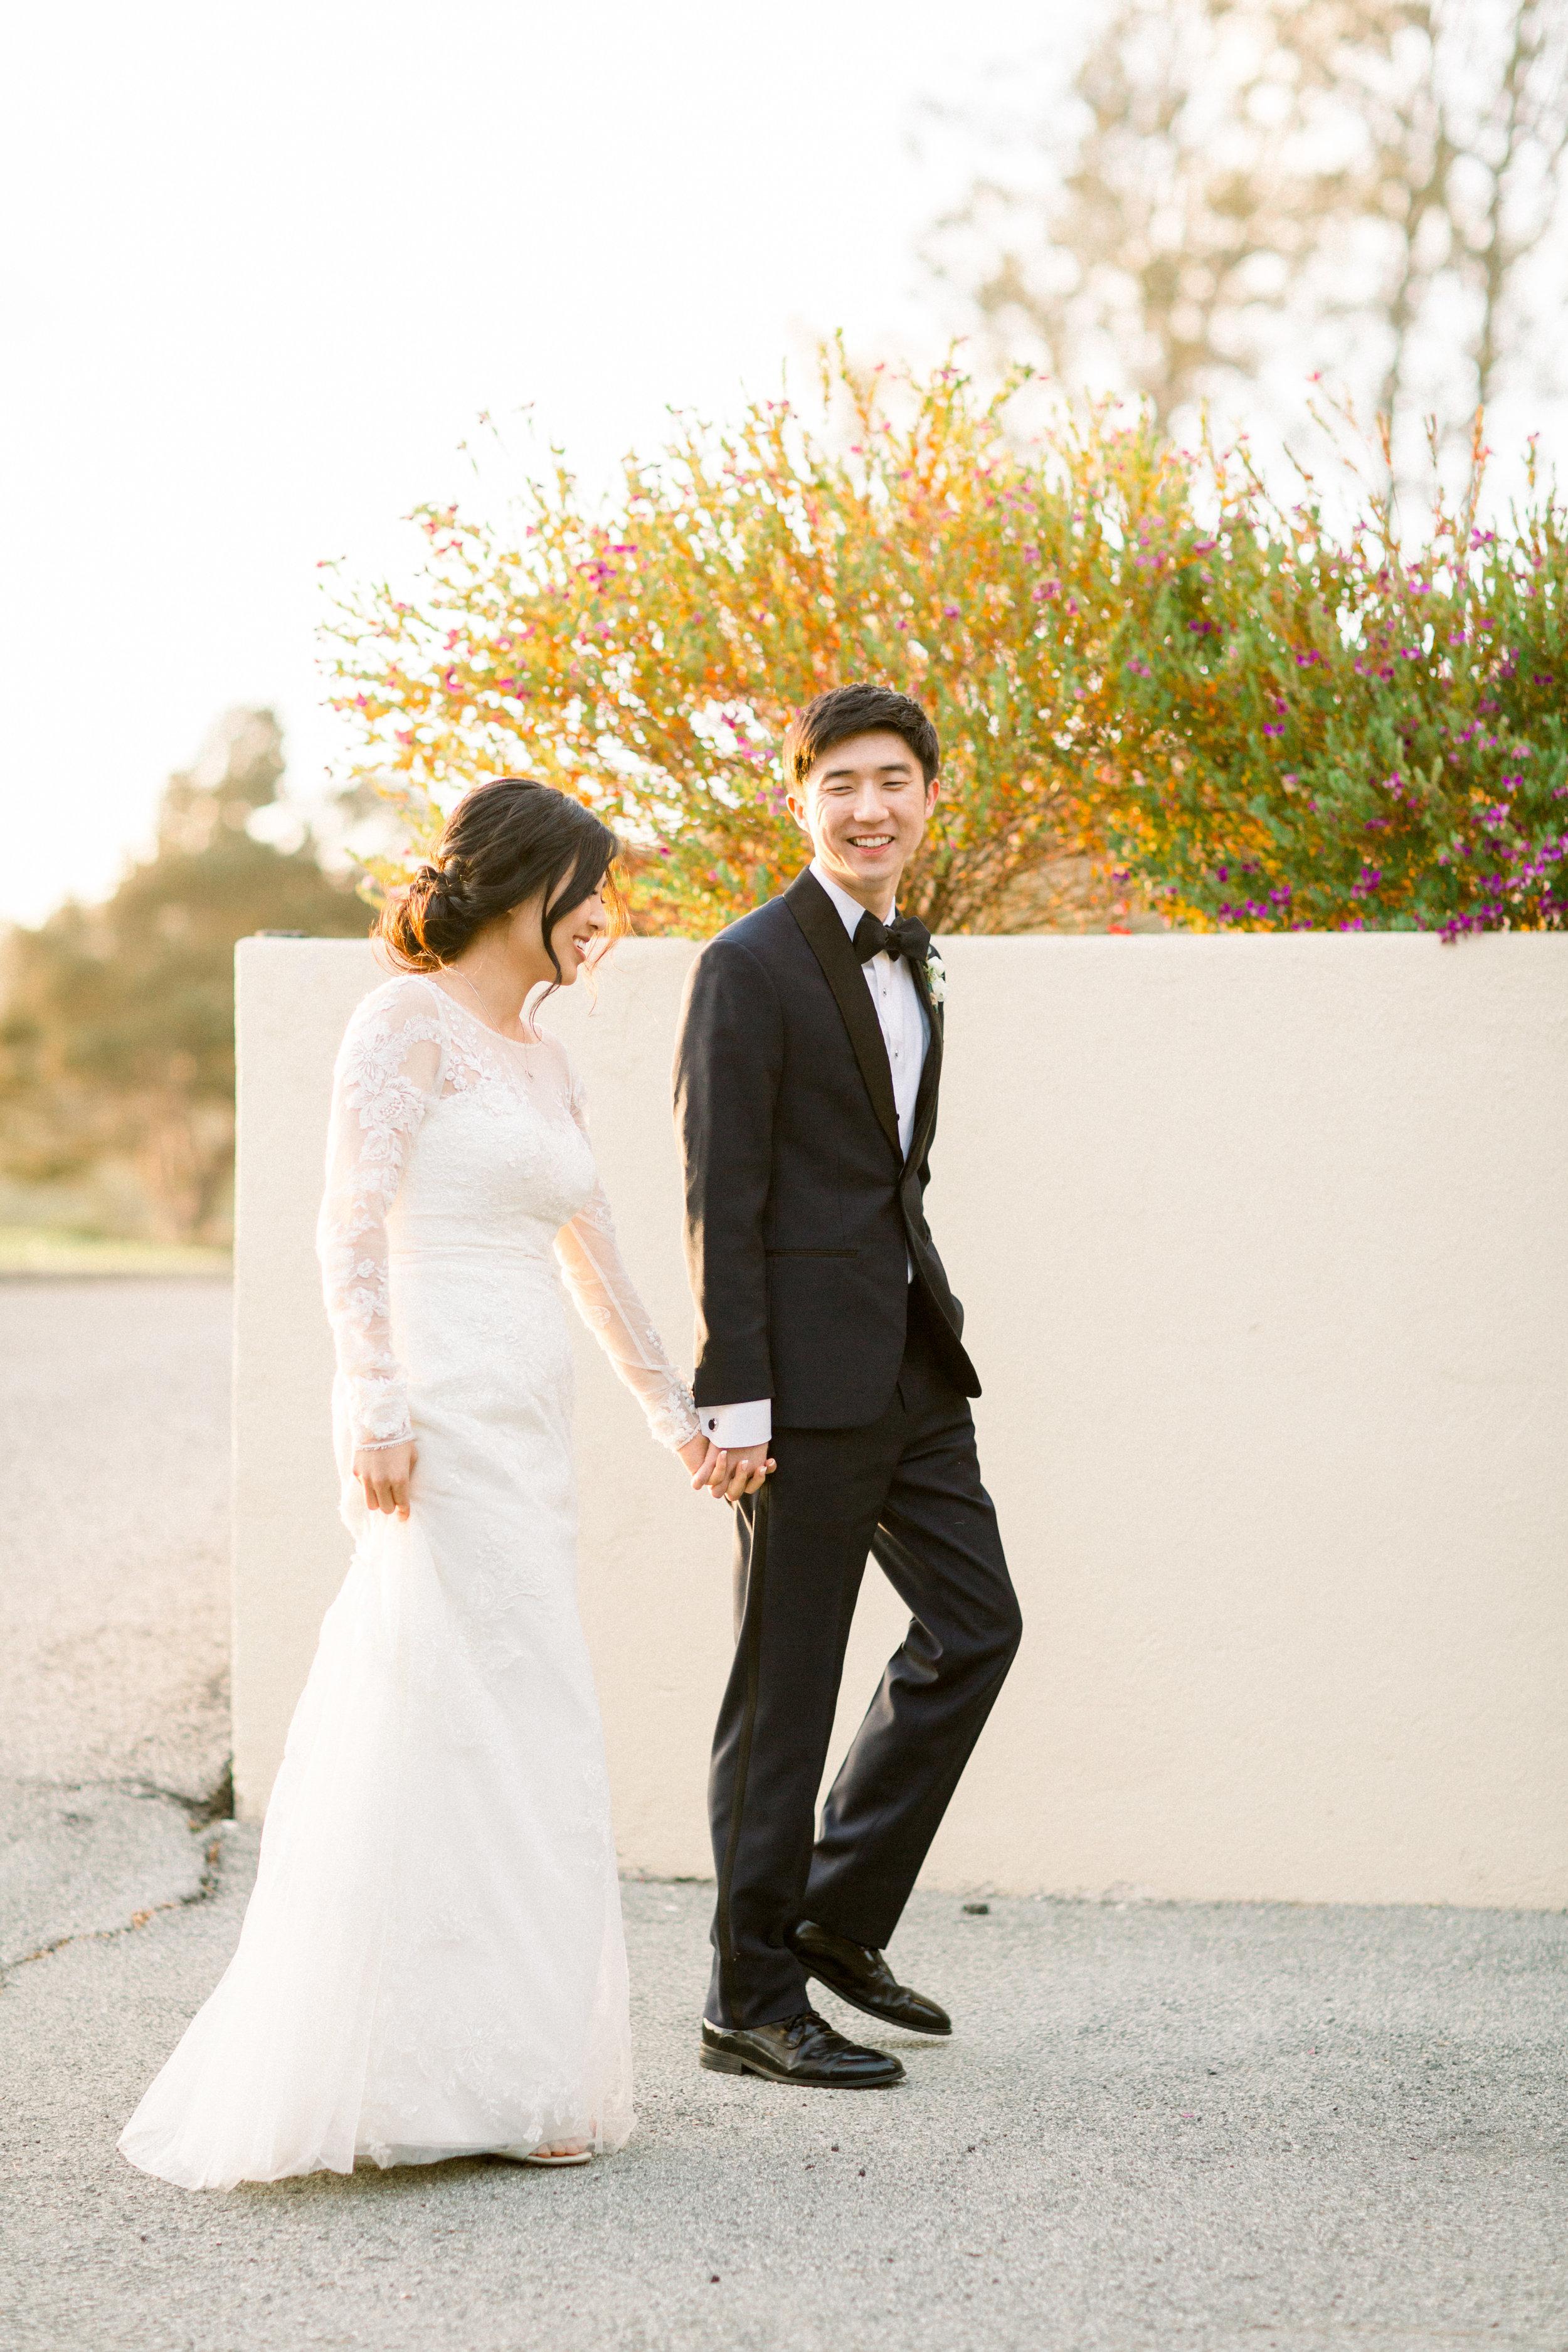 Cliffside-Carmel-valley-wedding-by-kristine-herman-photography-32.jpg